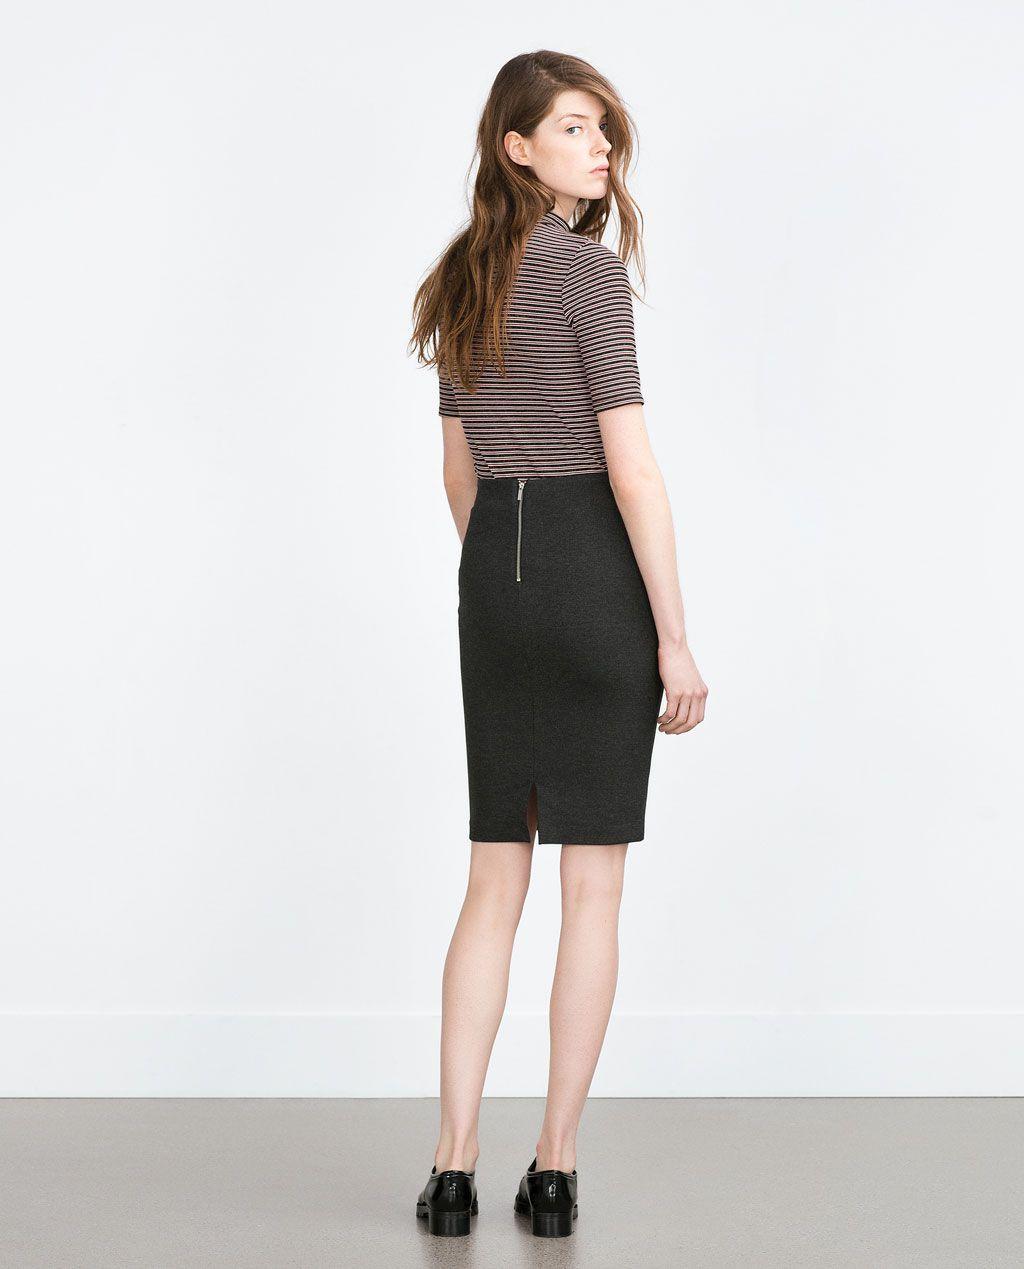 0a2a84083 Imagen 2 de FALDA TUBO de Zara | Basics | Faldas tubo, Faldas y Ropa